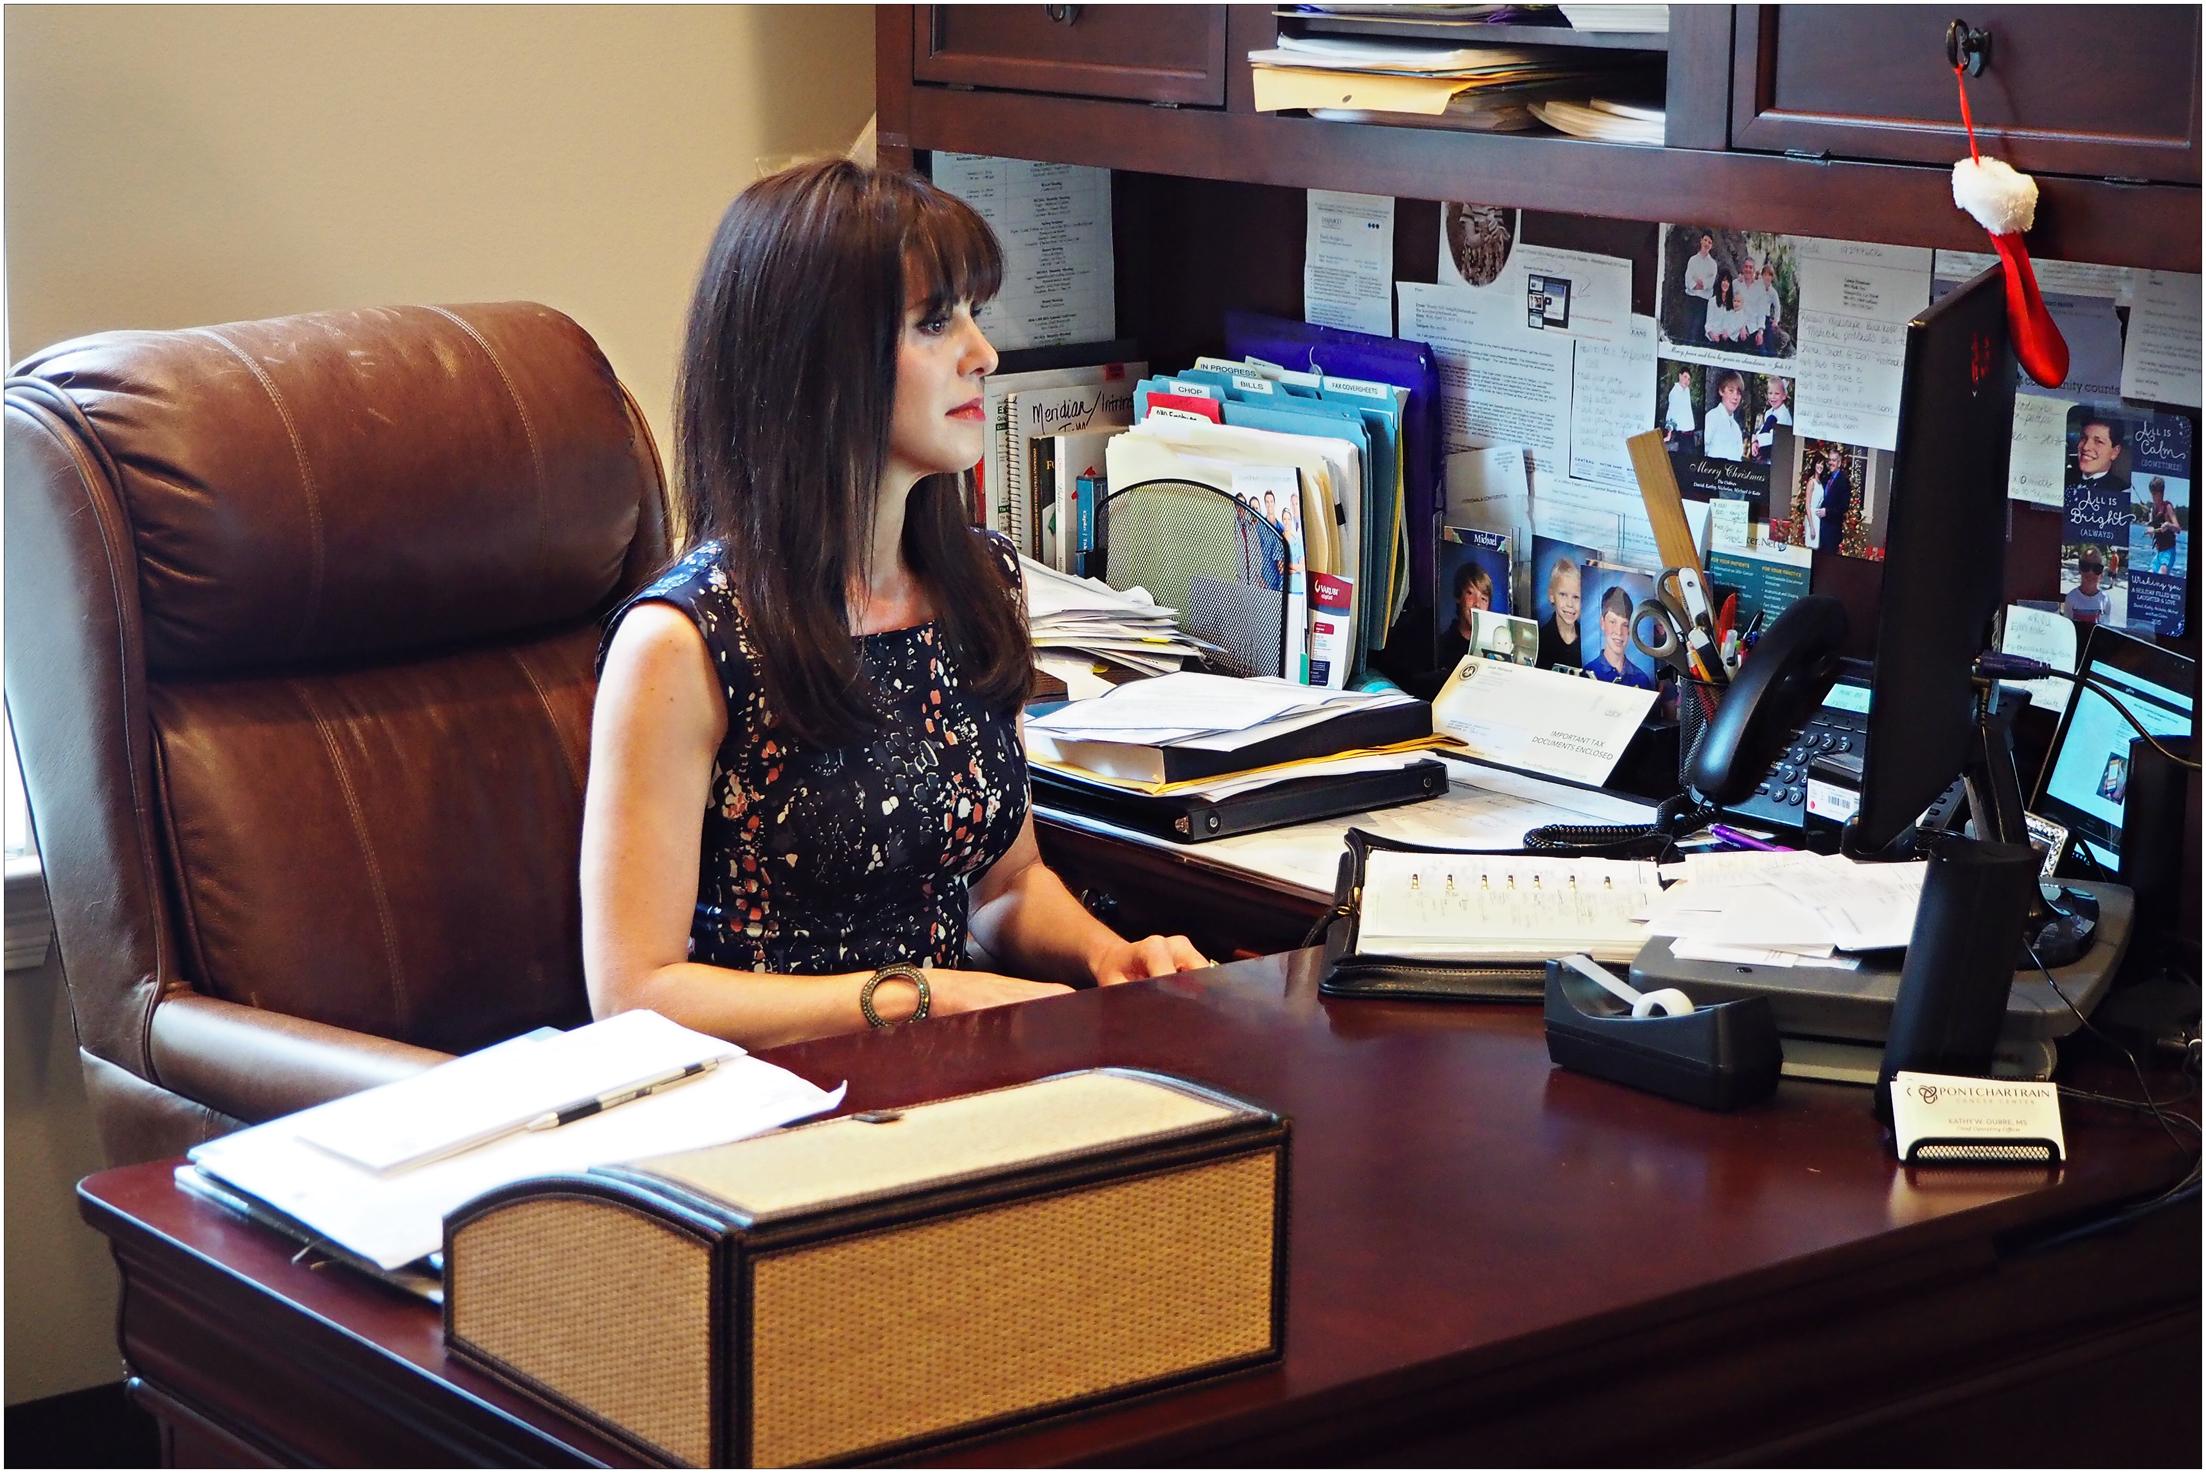 Kathy-Office.jpg